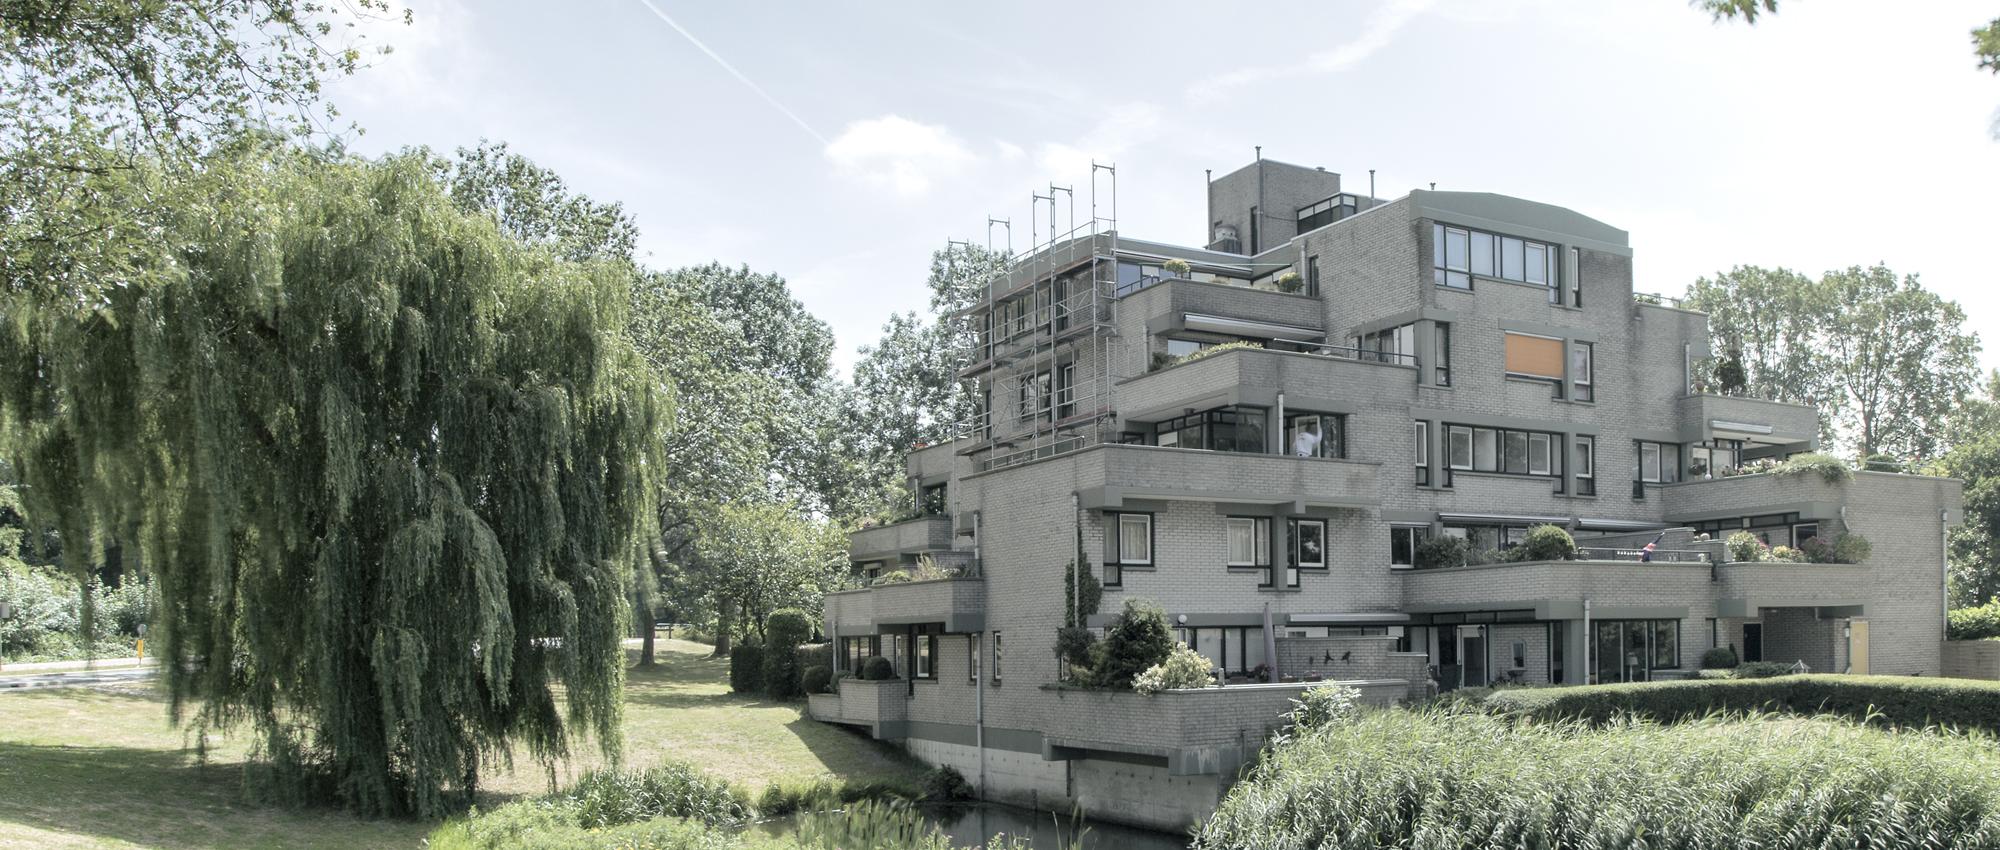 Terrasflat zoetermeer experimentele woningbouw